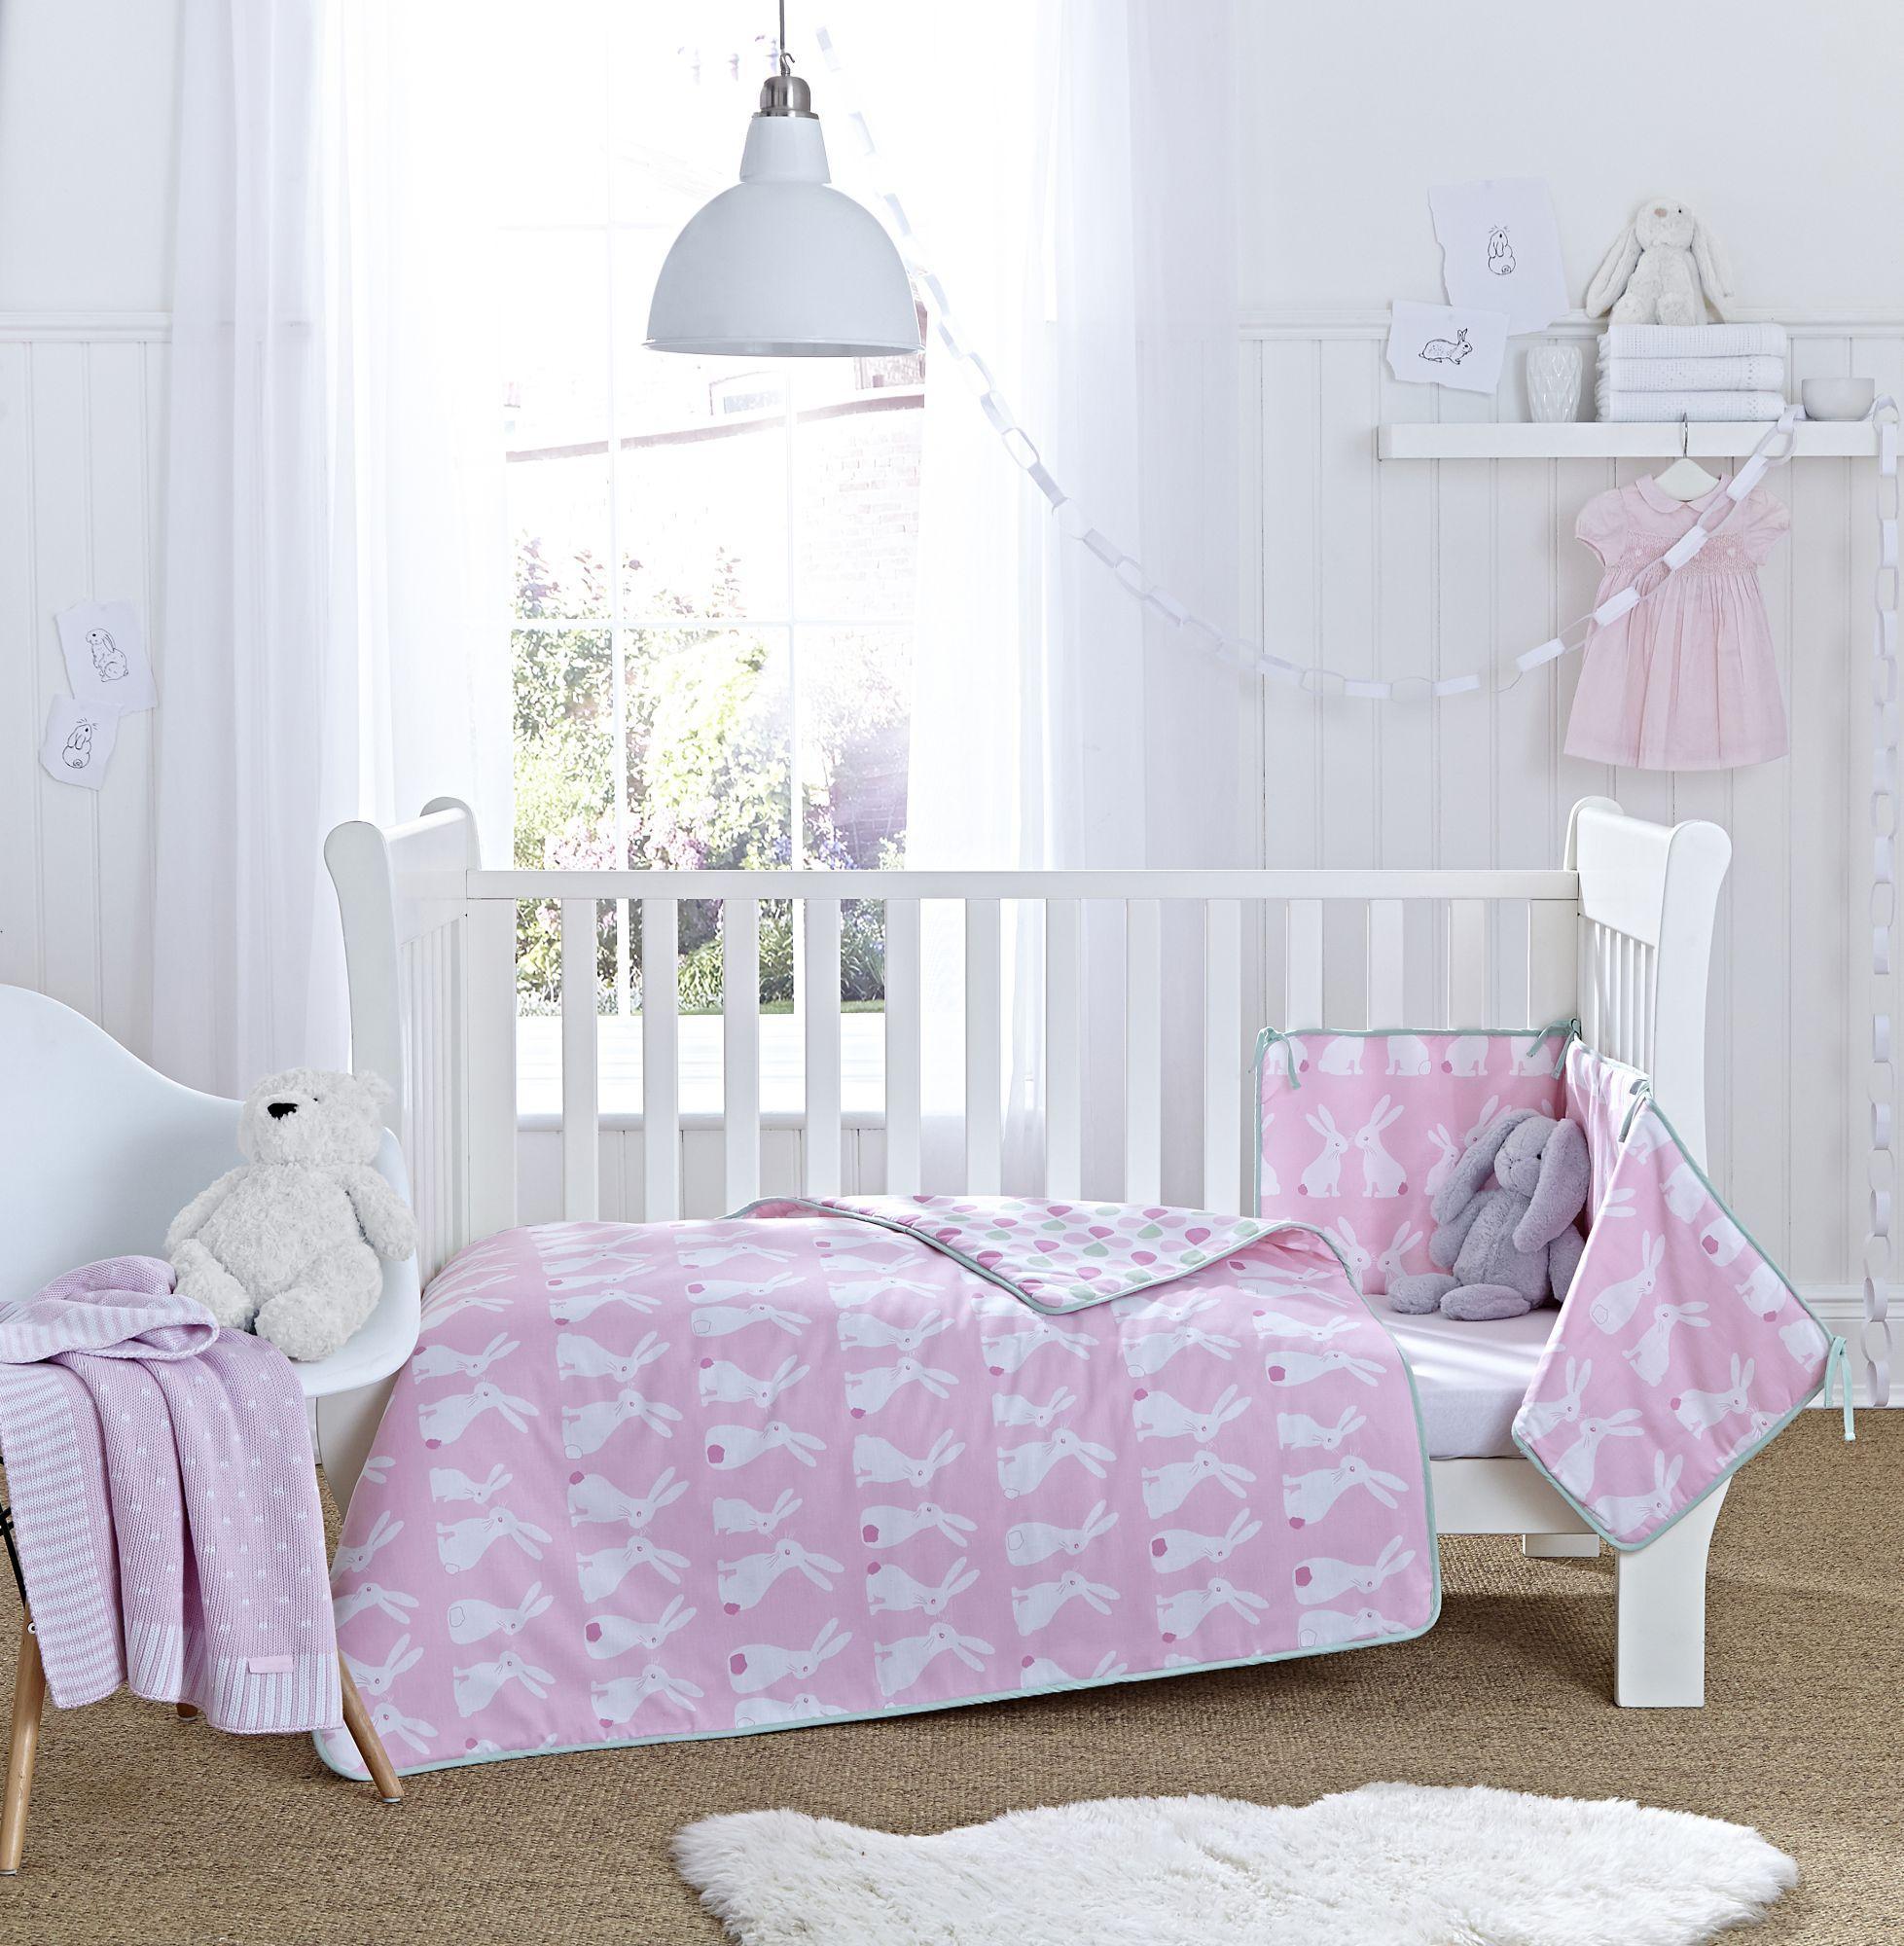 Clair De Lune Pink Rabbits Cot Cot Bed Quilt And Bumper Bedding Set Baby